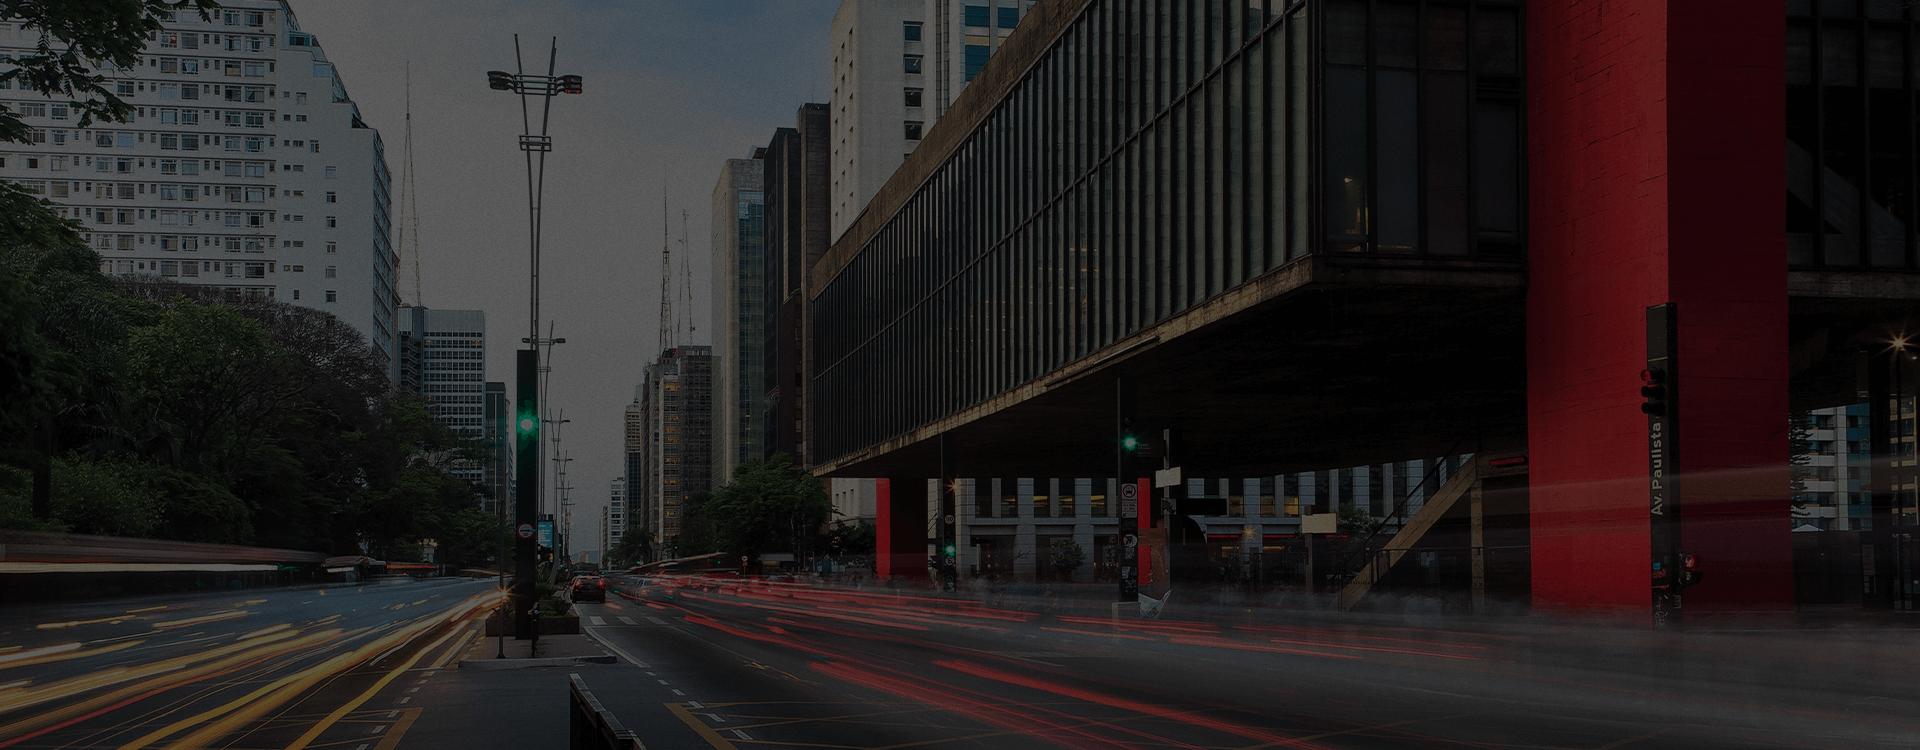 bg-banner-paulista